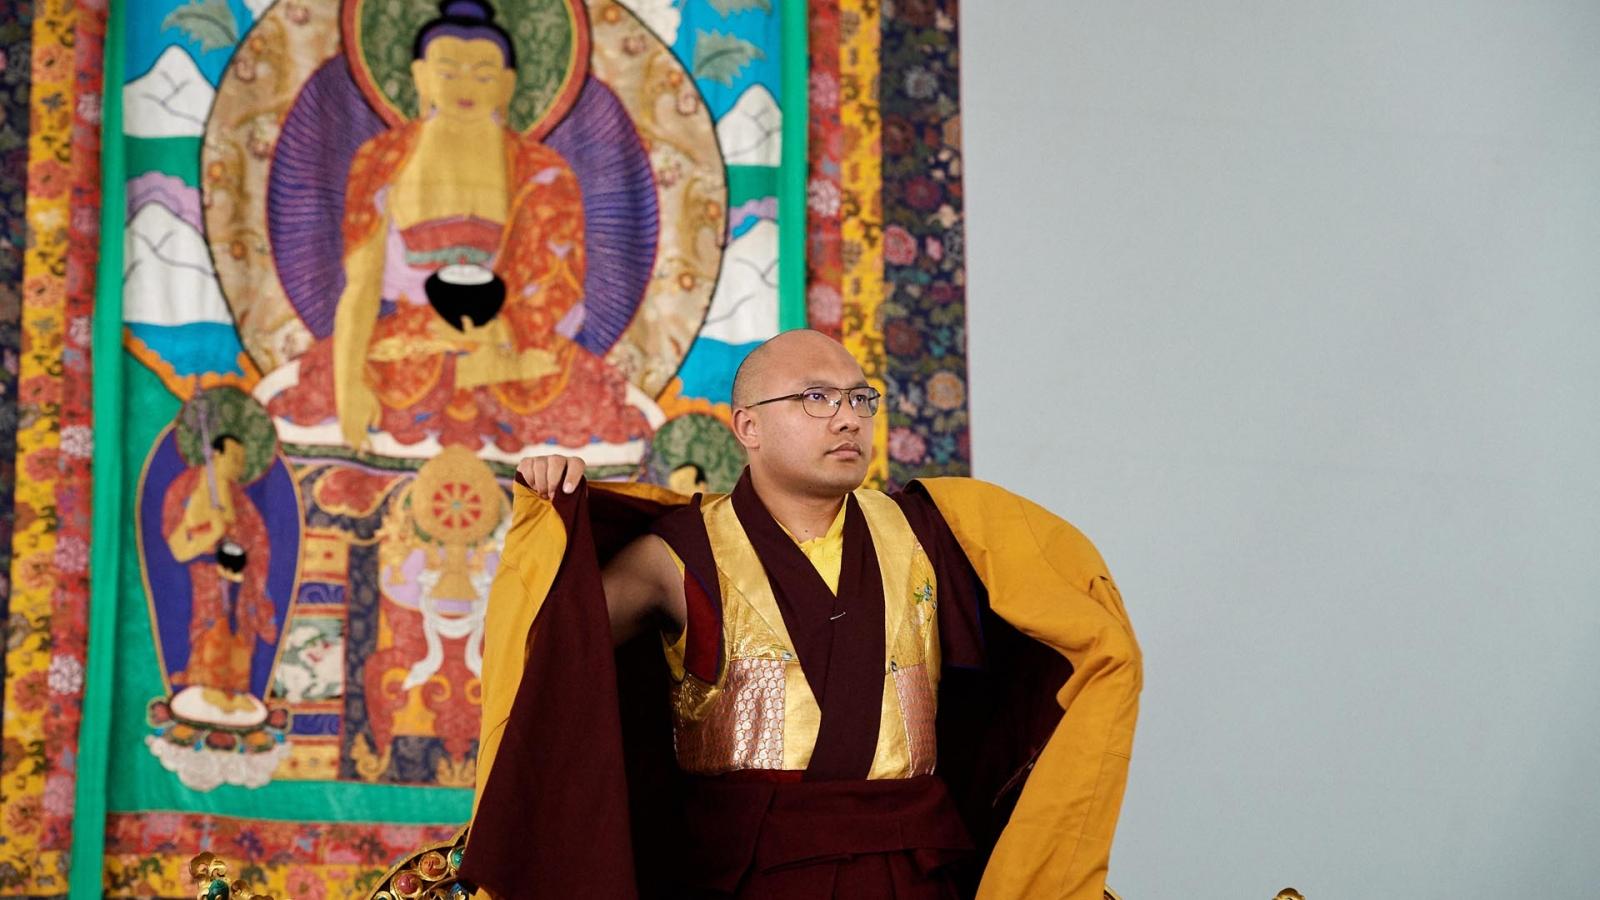 Karmapa and Buddha image